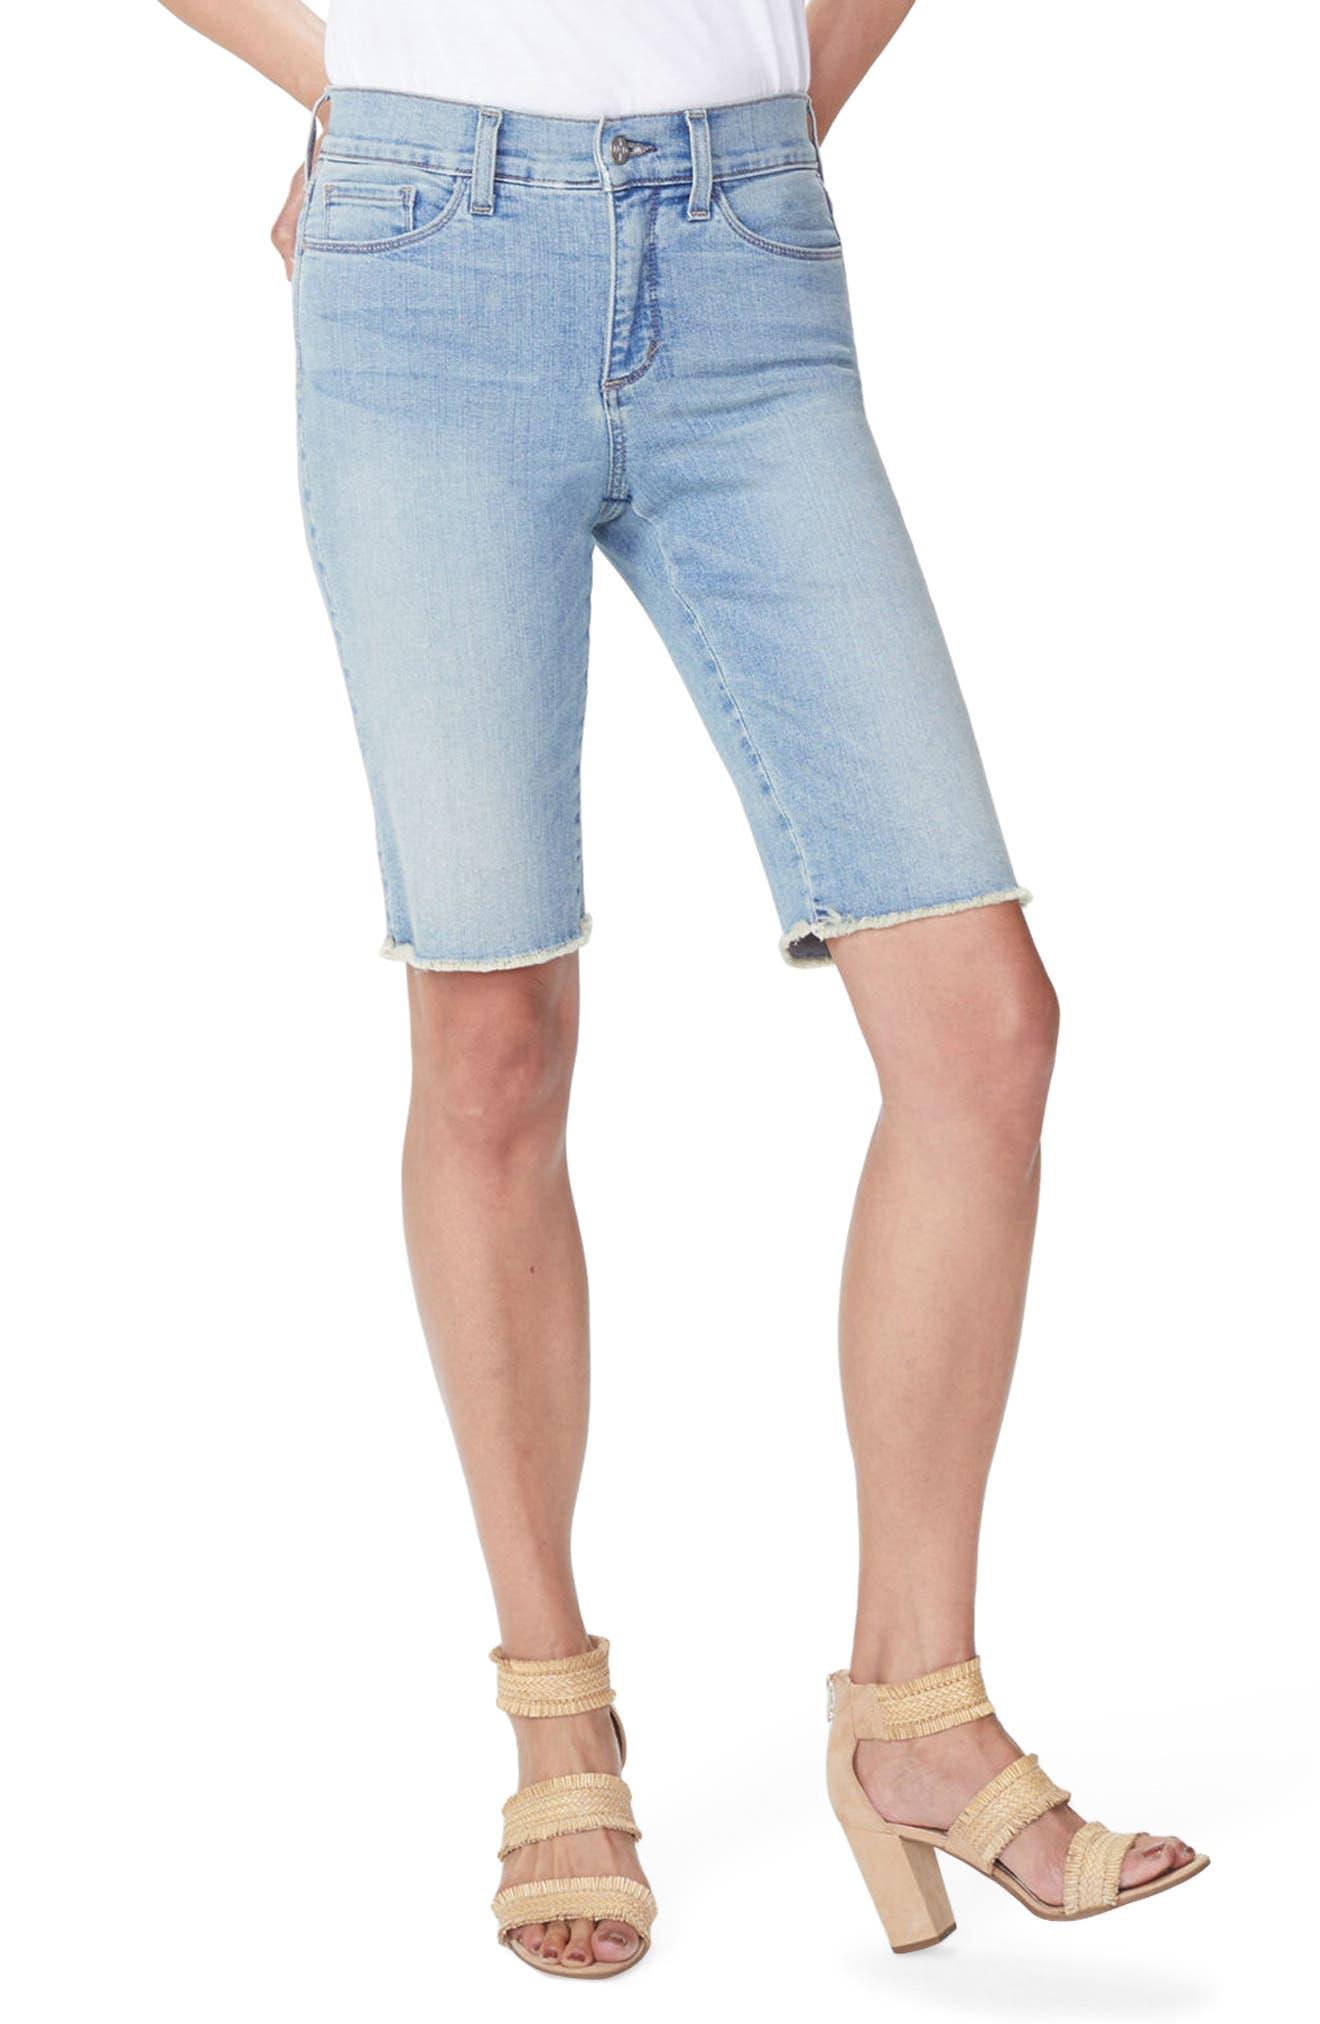 Briella Frayed Hem Denim Bermuda Shorts,                             Main thumbnail 1, color,                             Westland